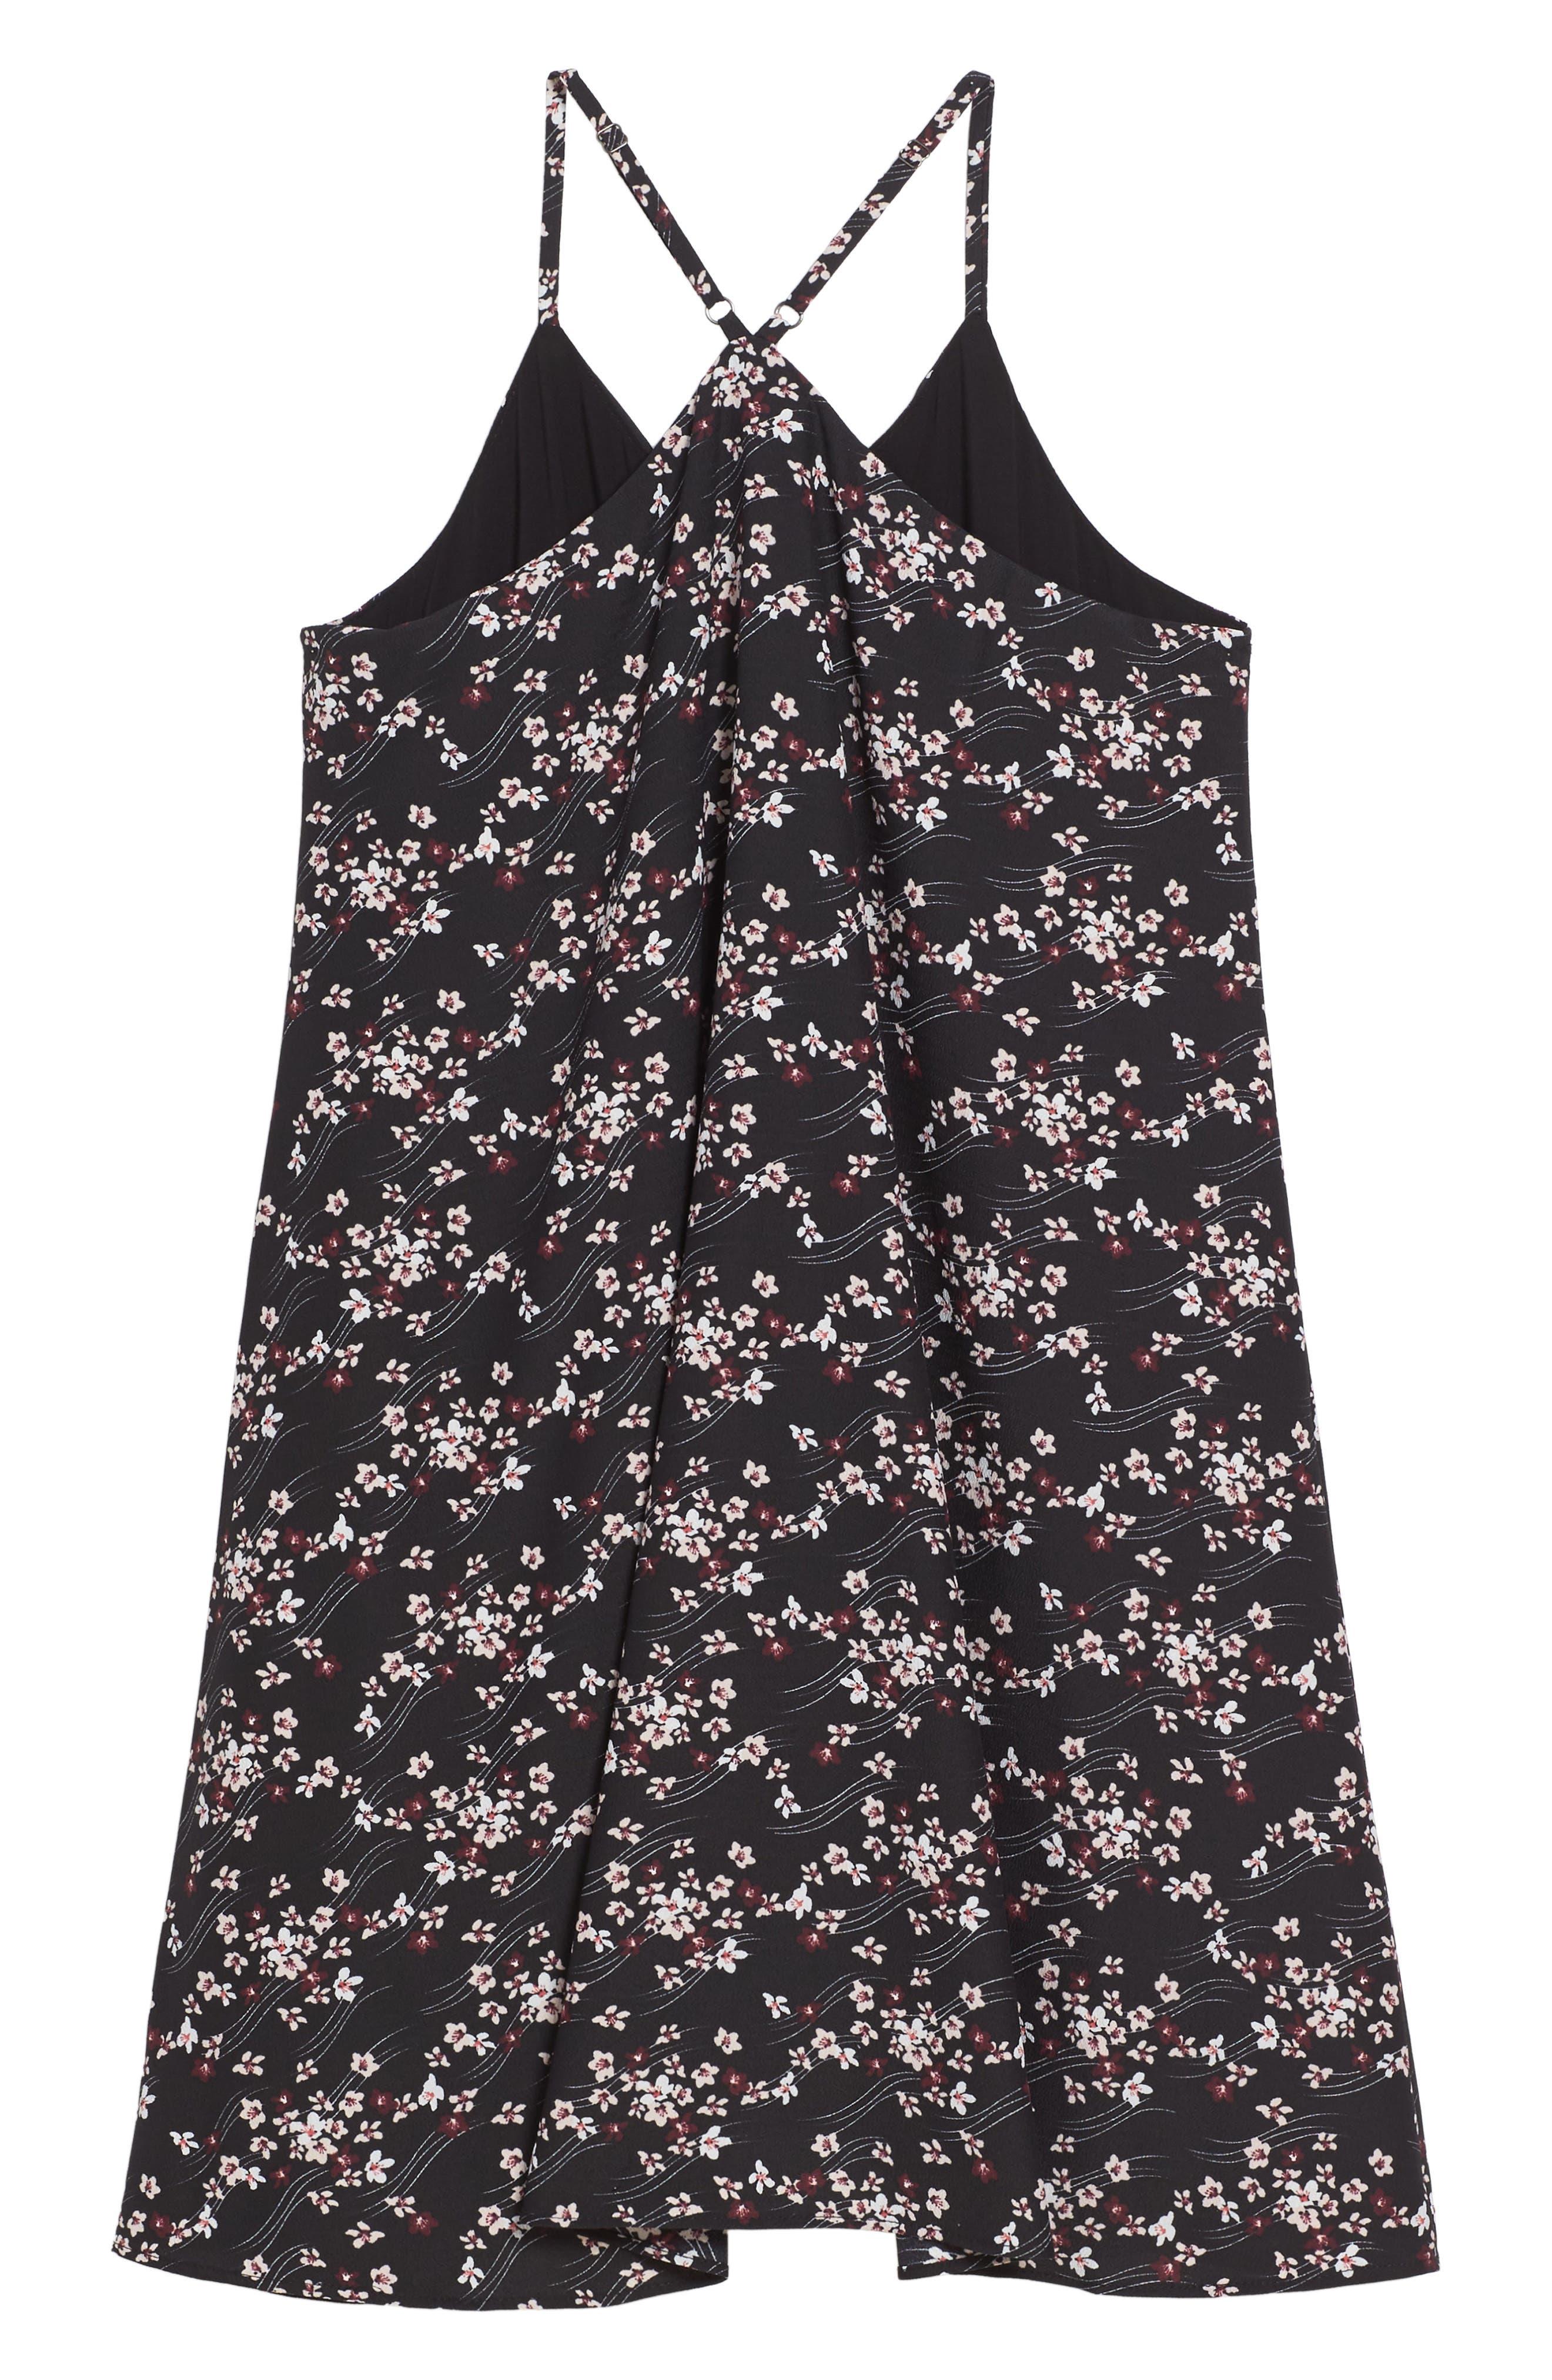 Alternate Image 2  - Maddie Floral Print Slip Dress (Big Girls)